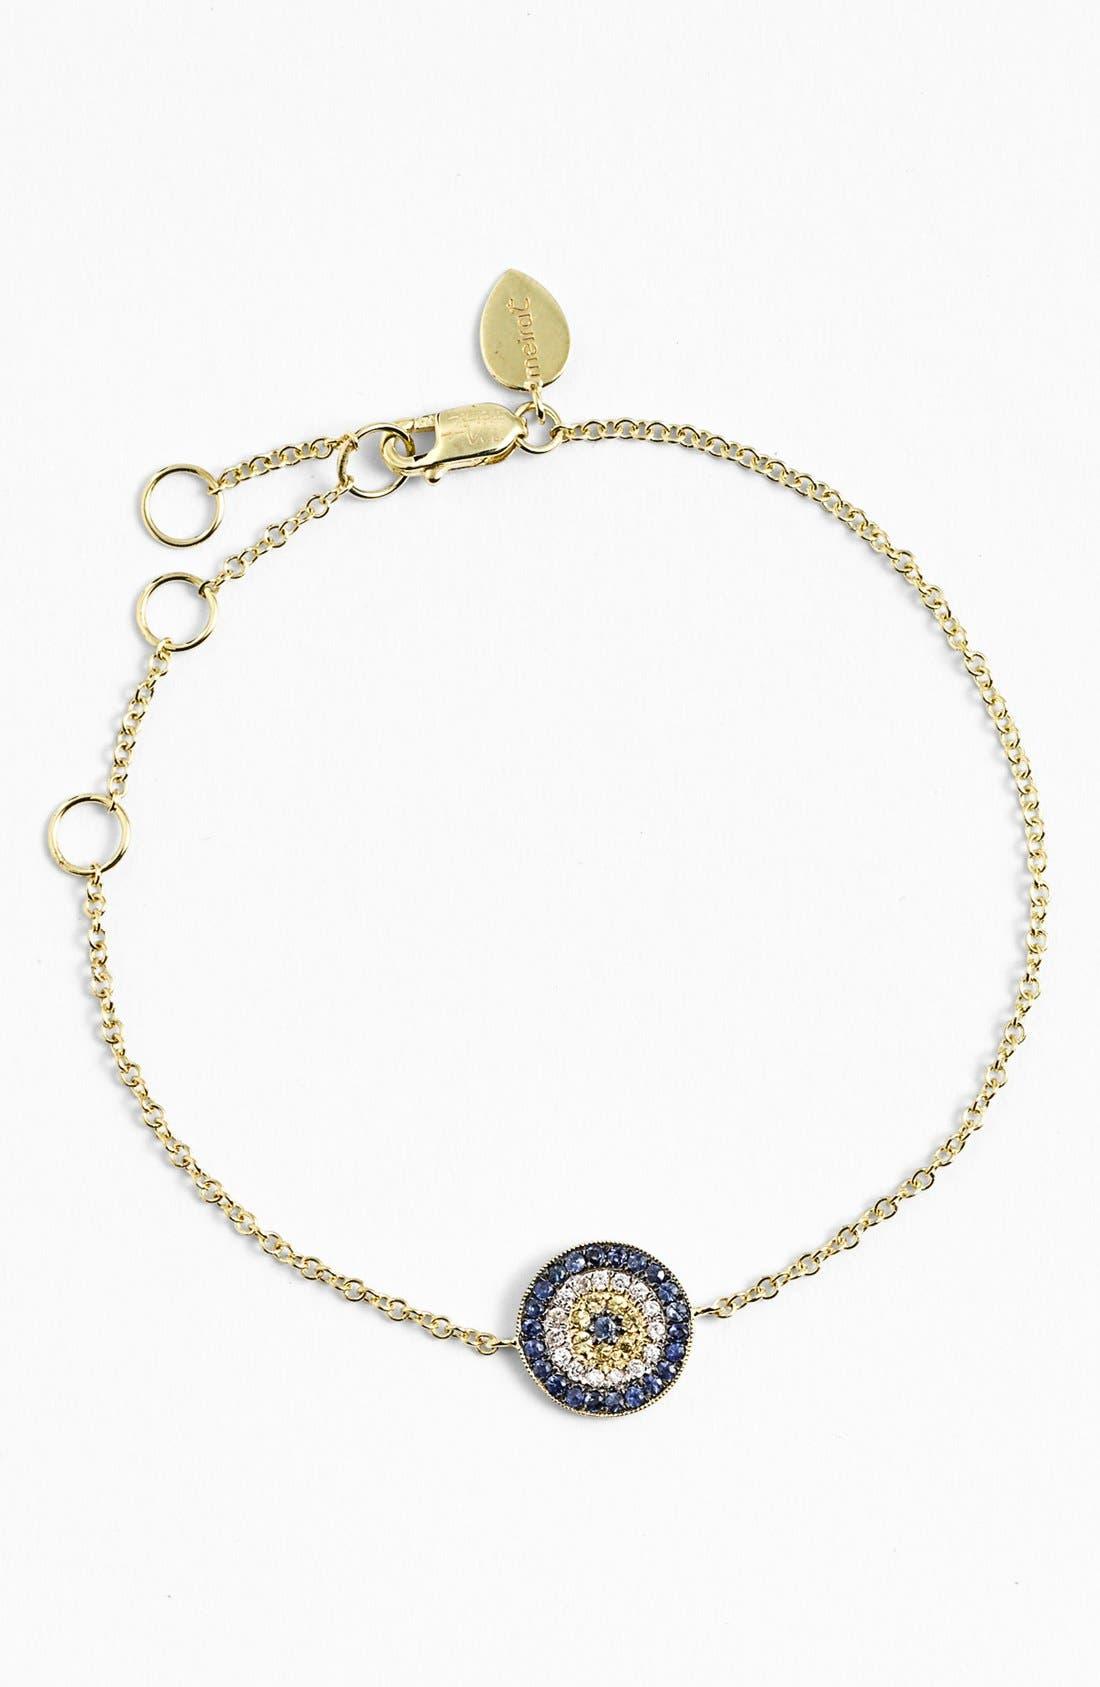 Alternate Image 1 Selected - MeiraT 'Desert Infusion' Diamond & Sapphire Station Bracelet